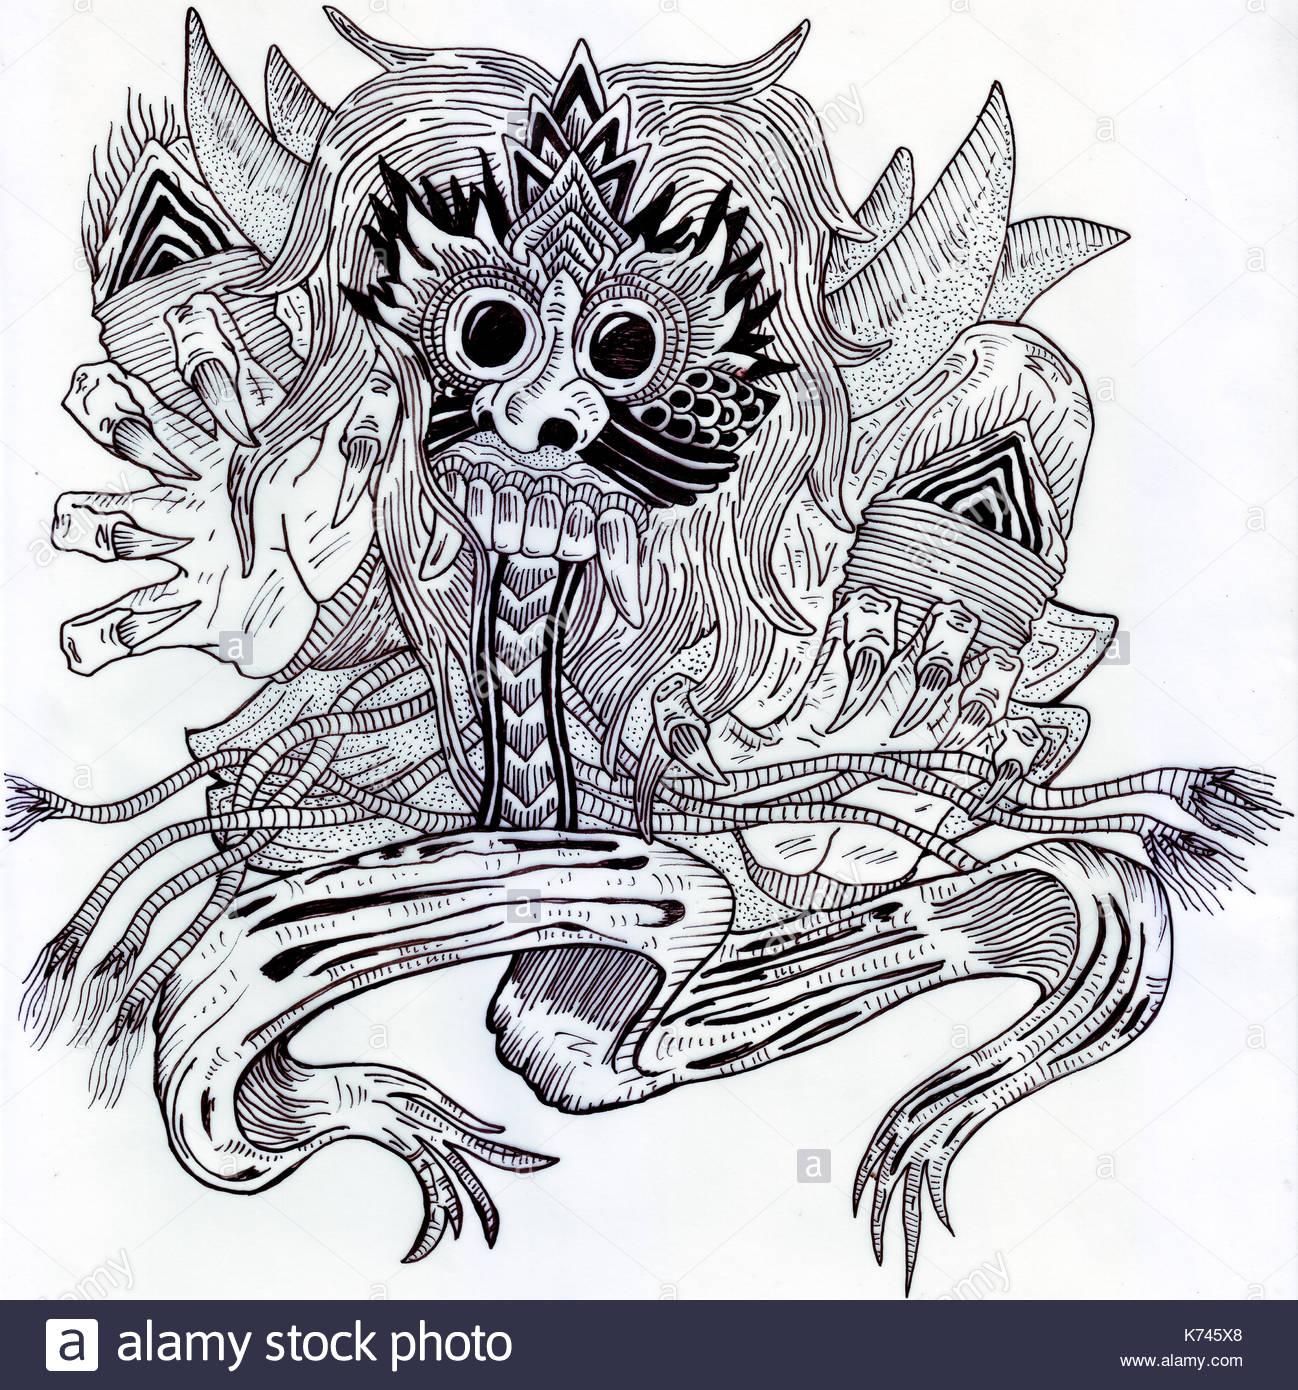 Sketch of Barong Bali, Indonesia. - Stock Image